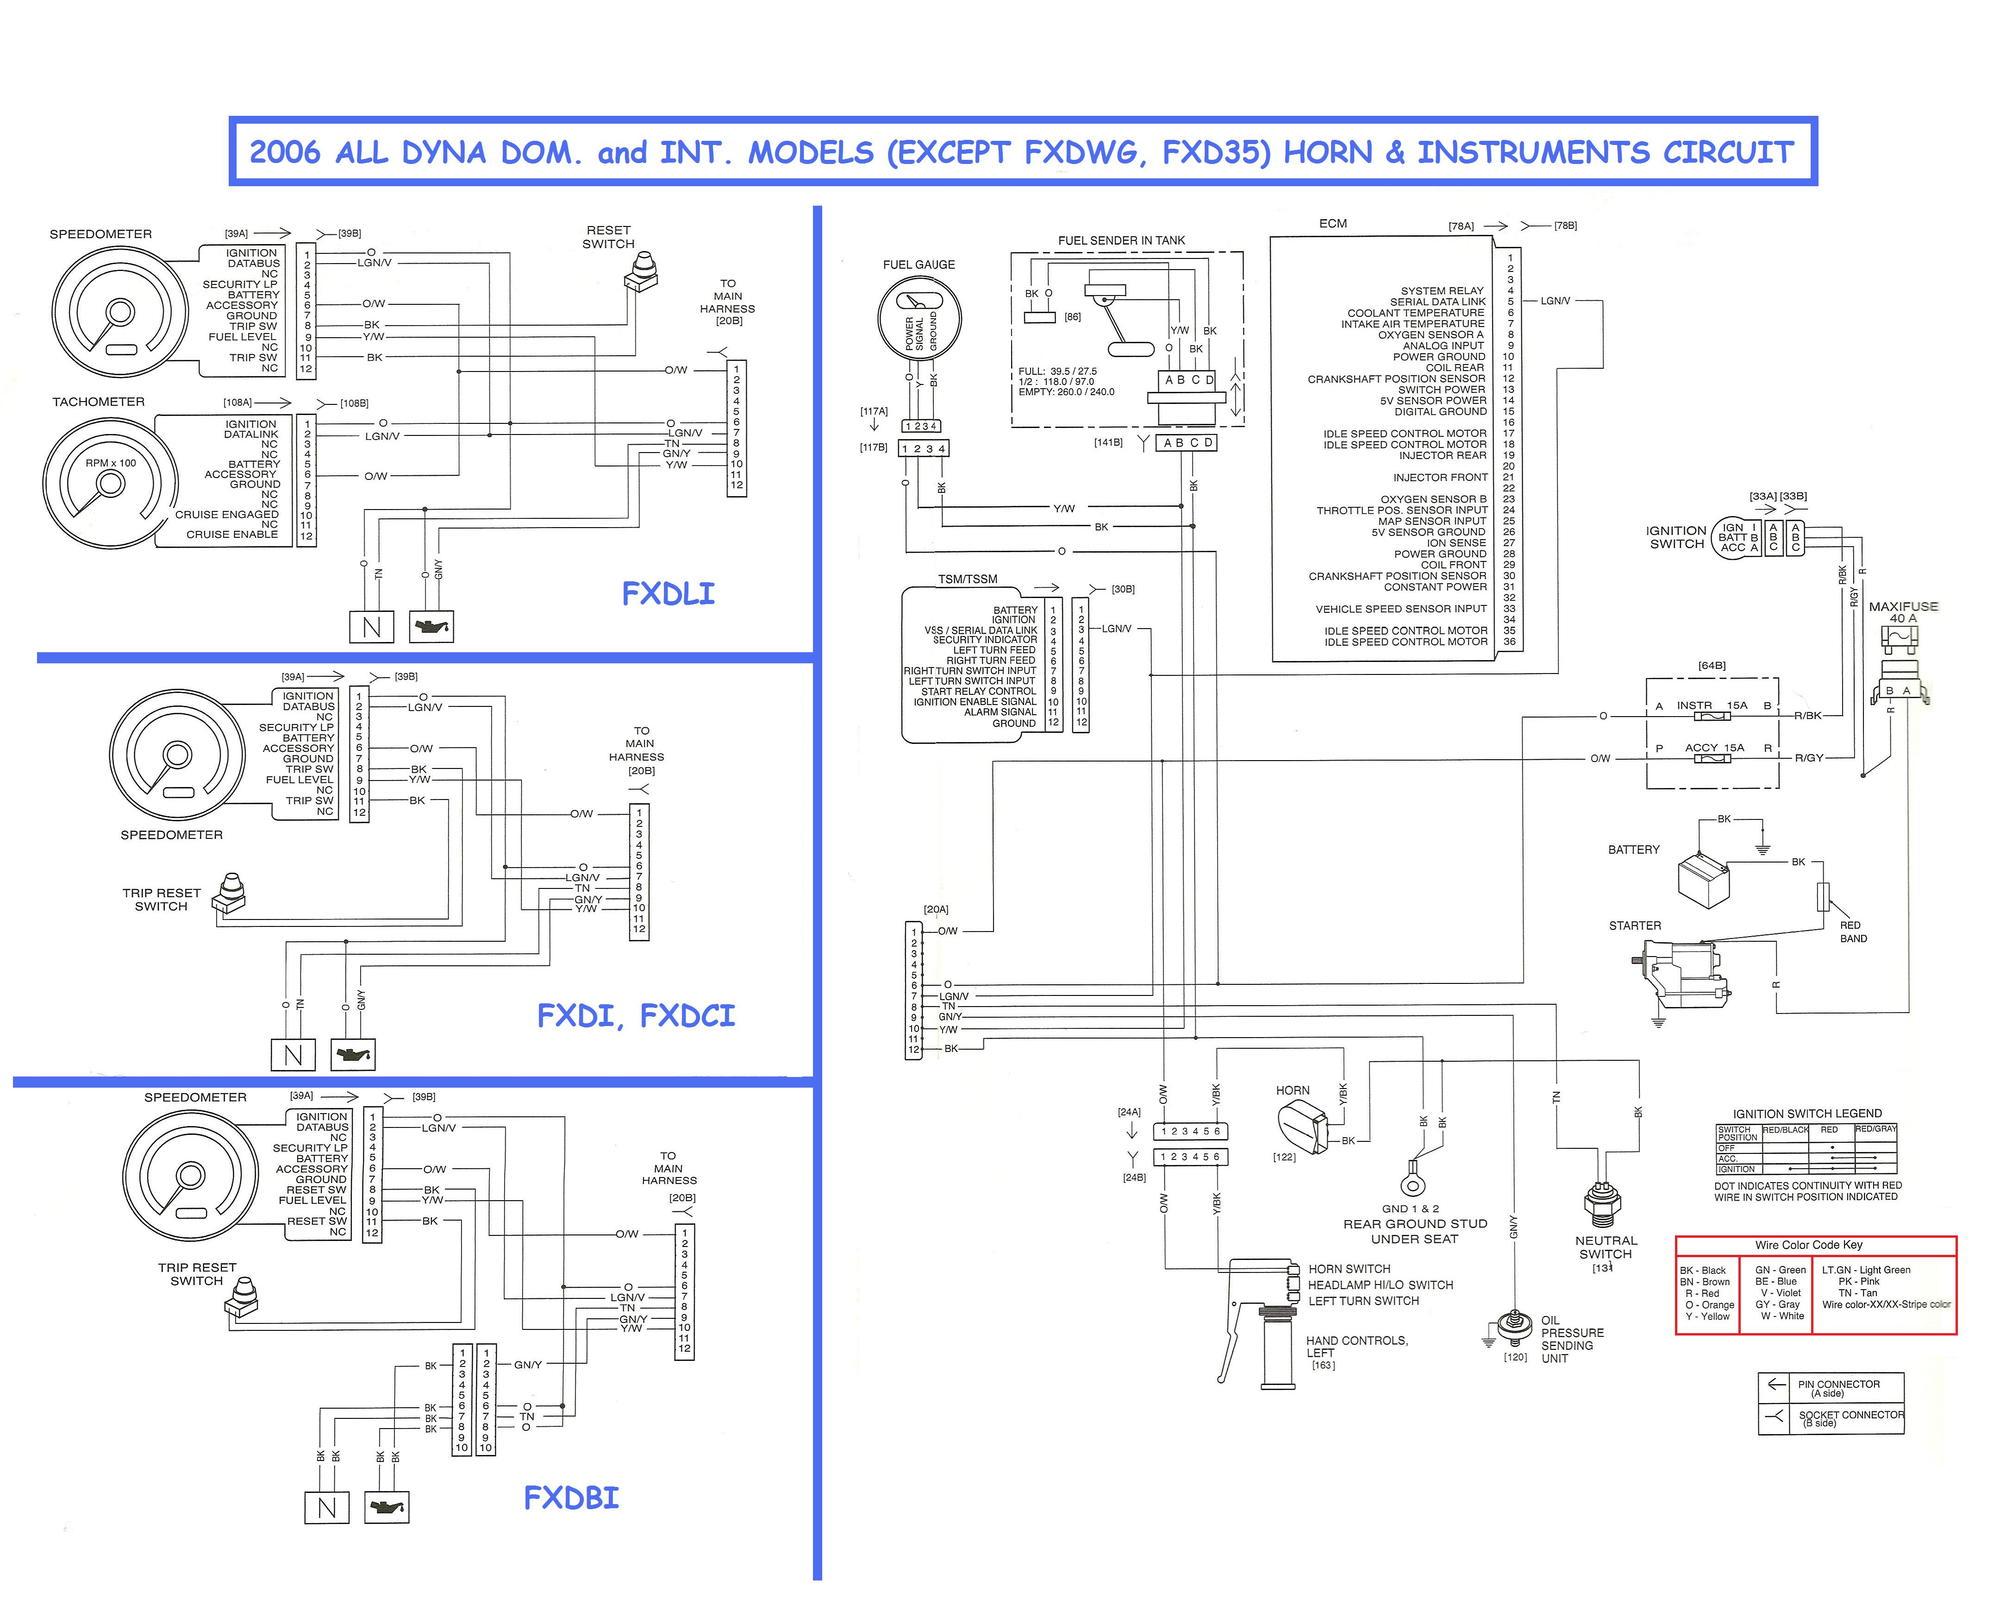 80 2006_horn_instruments_0a303e3149af4f5abb1efc8bca4f3161682c4629?resize\\\=665%2C536\\\&ssl\\\=1 1999 softail wiring diagram wiring diagram byblank 3 Wire Headlight Wiring Diagram at reclaimingppi.co